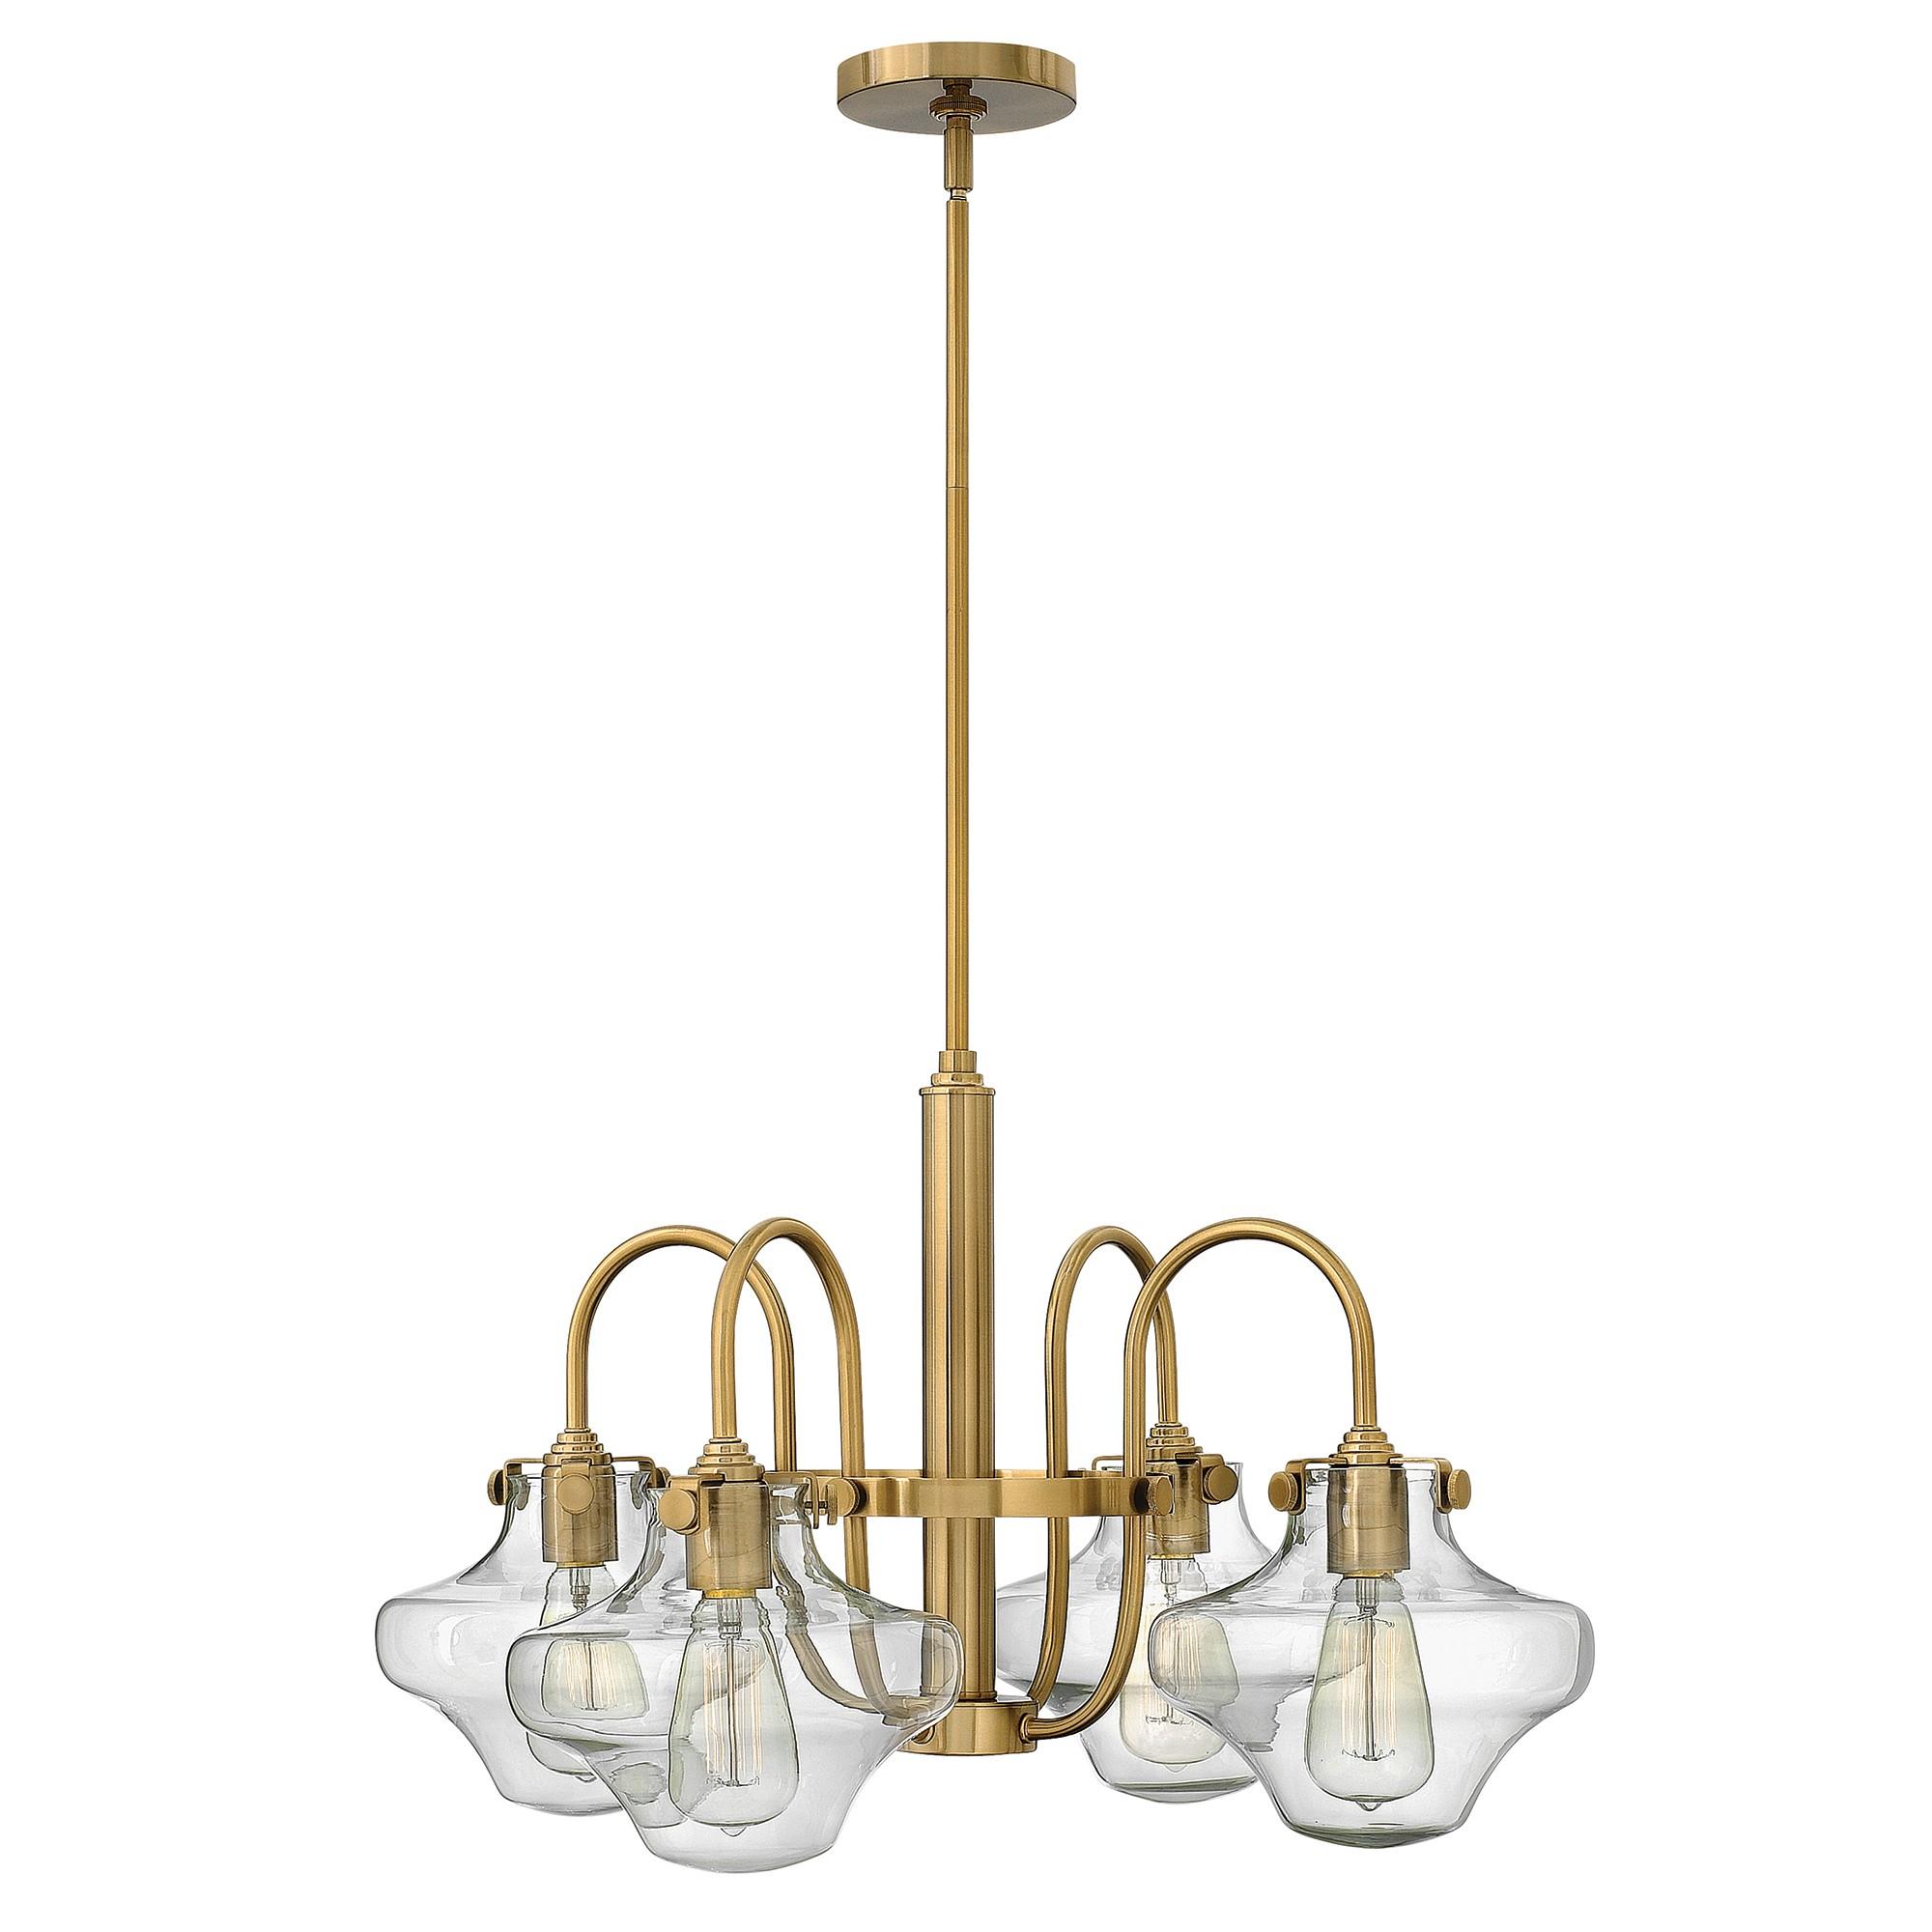 light clear chrome cfm index pendant elk chandelier and in lighting elite polished fixtures glass danica